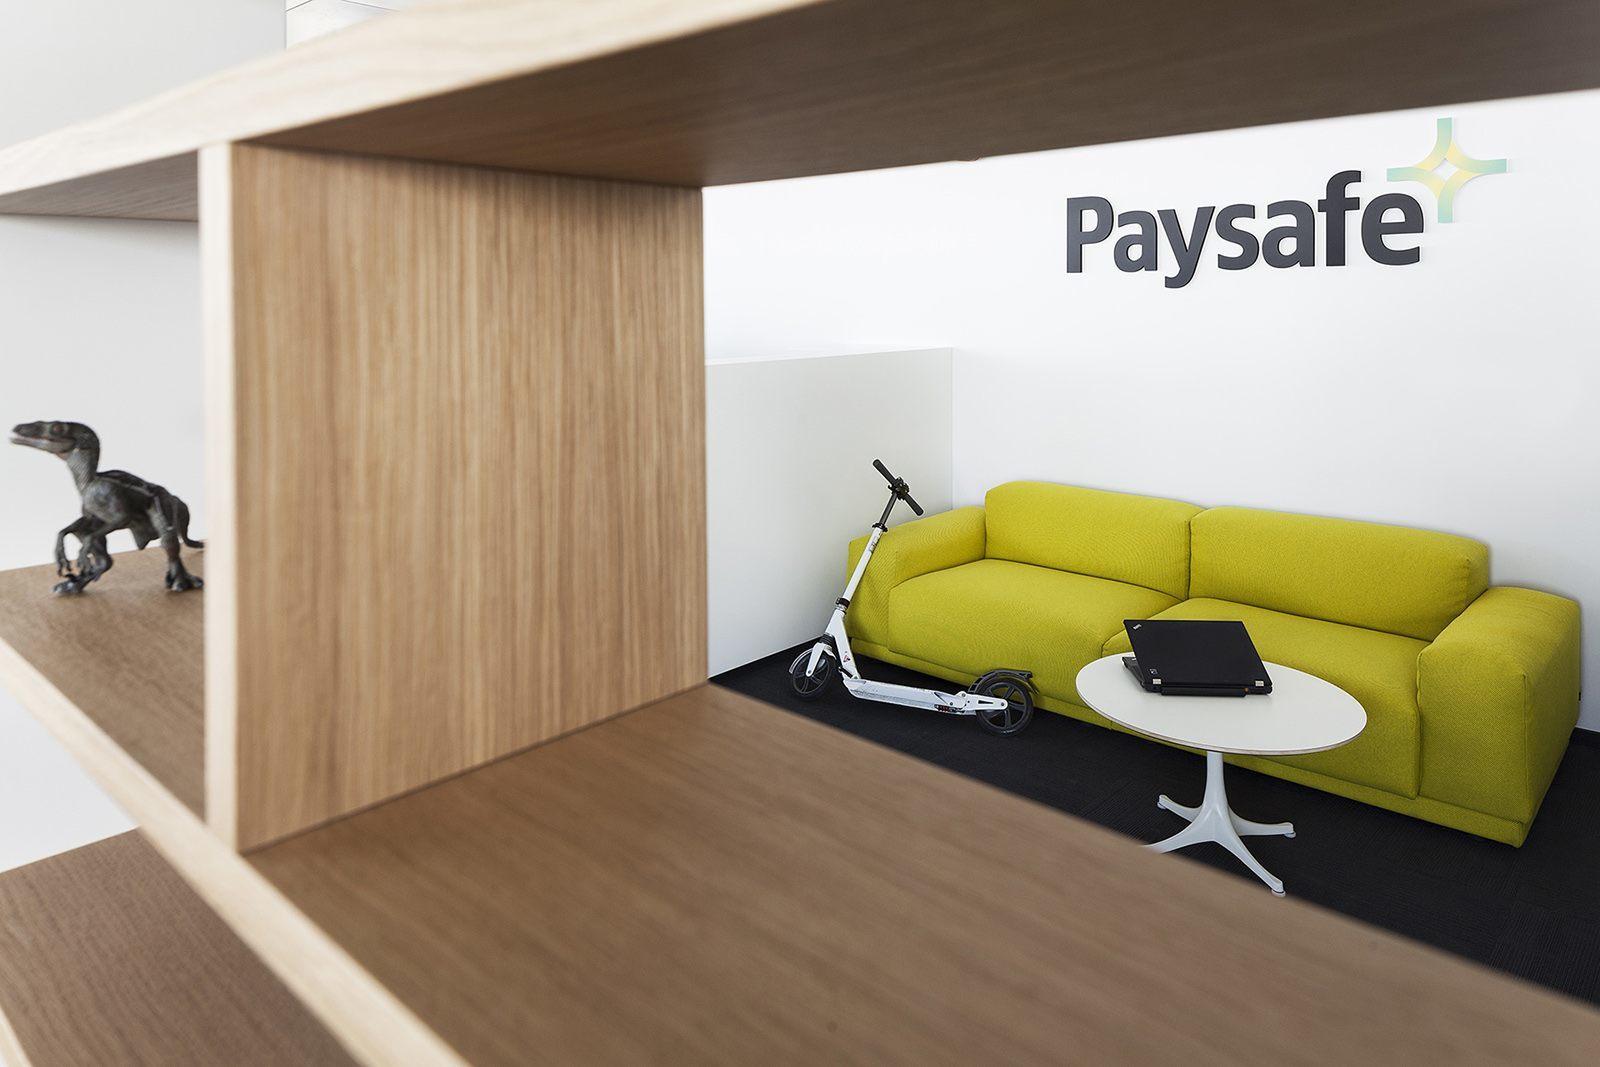 Paysafe-office-developers-cache atelier-Sofia-Bulgaria-1-reception desk